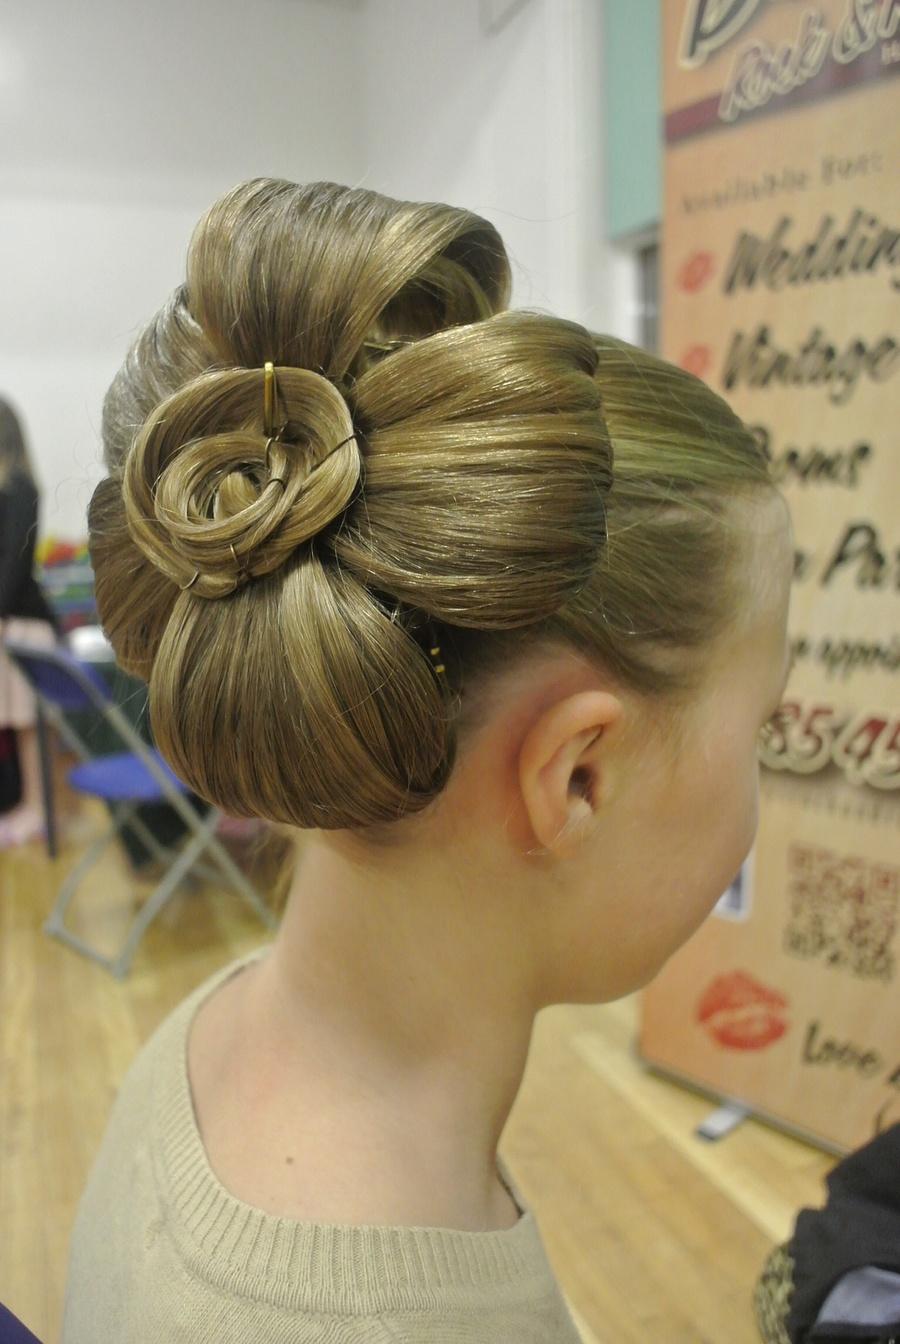 Flower Design / Hair styling by JennyWest_HairandMua / Uploaded 9th January 2015 @ 10:27 AM